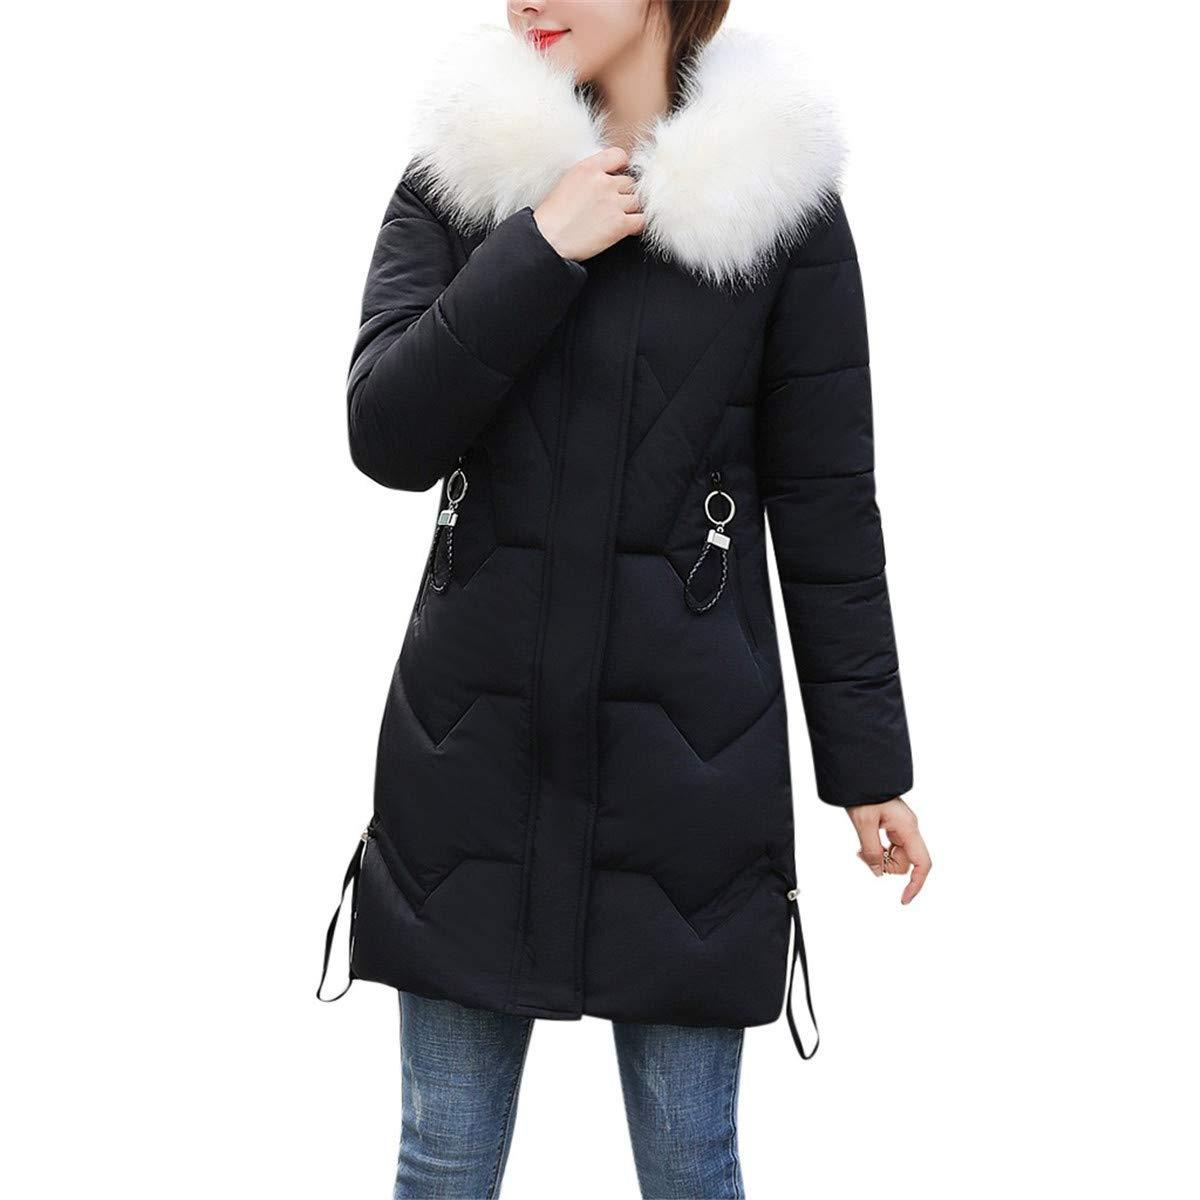 Thenxin Women's Winter Warm Hooded Jacket Coat Faux Fur Collar Basic Parka Puffer Coats(Black,M) by Thenxin